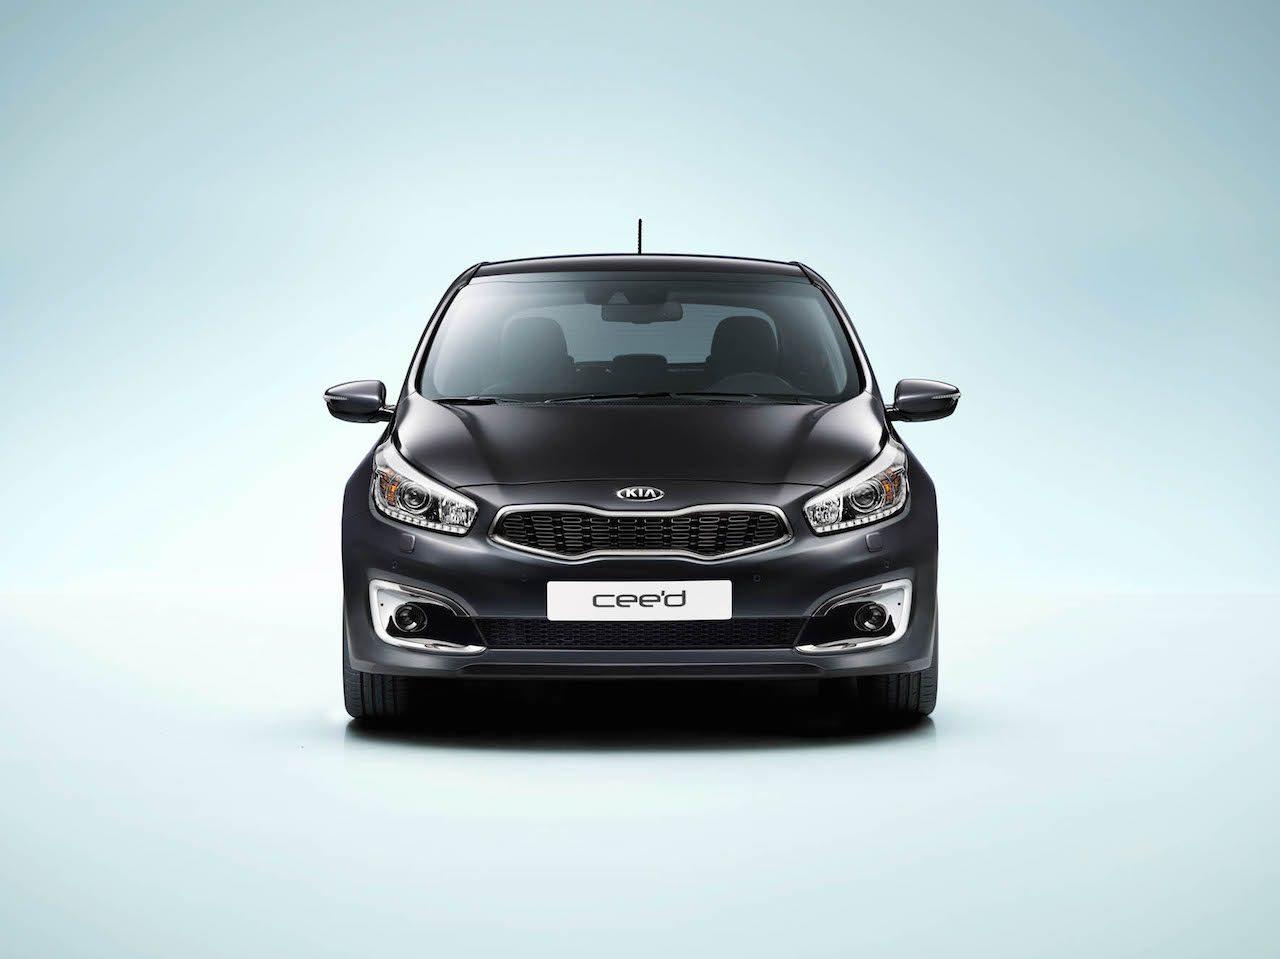 kia-ceed-facelift-2015-001.jpg